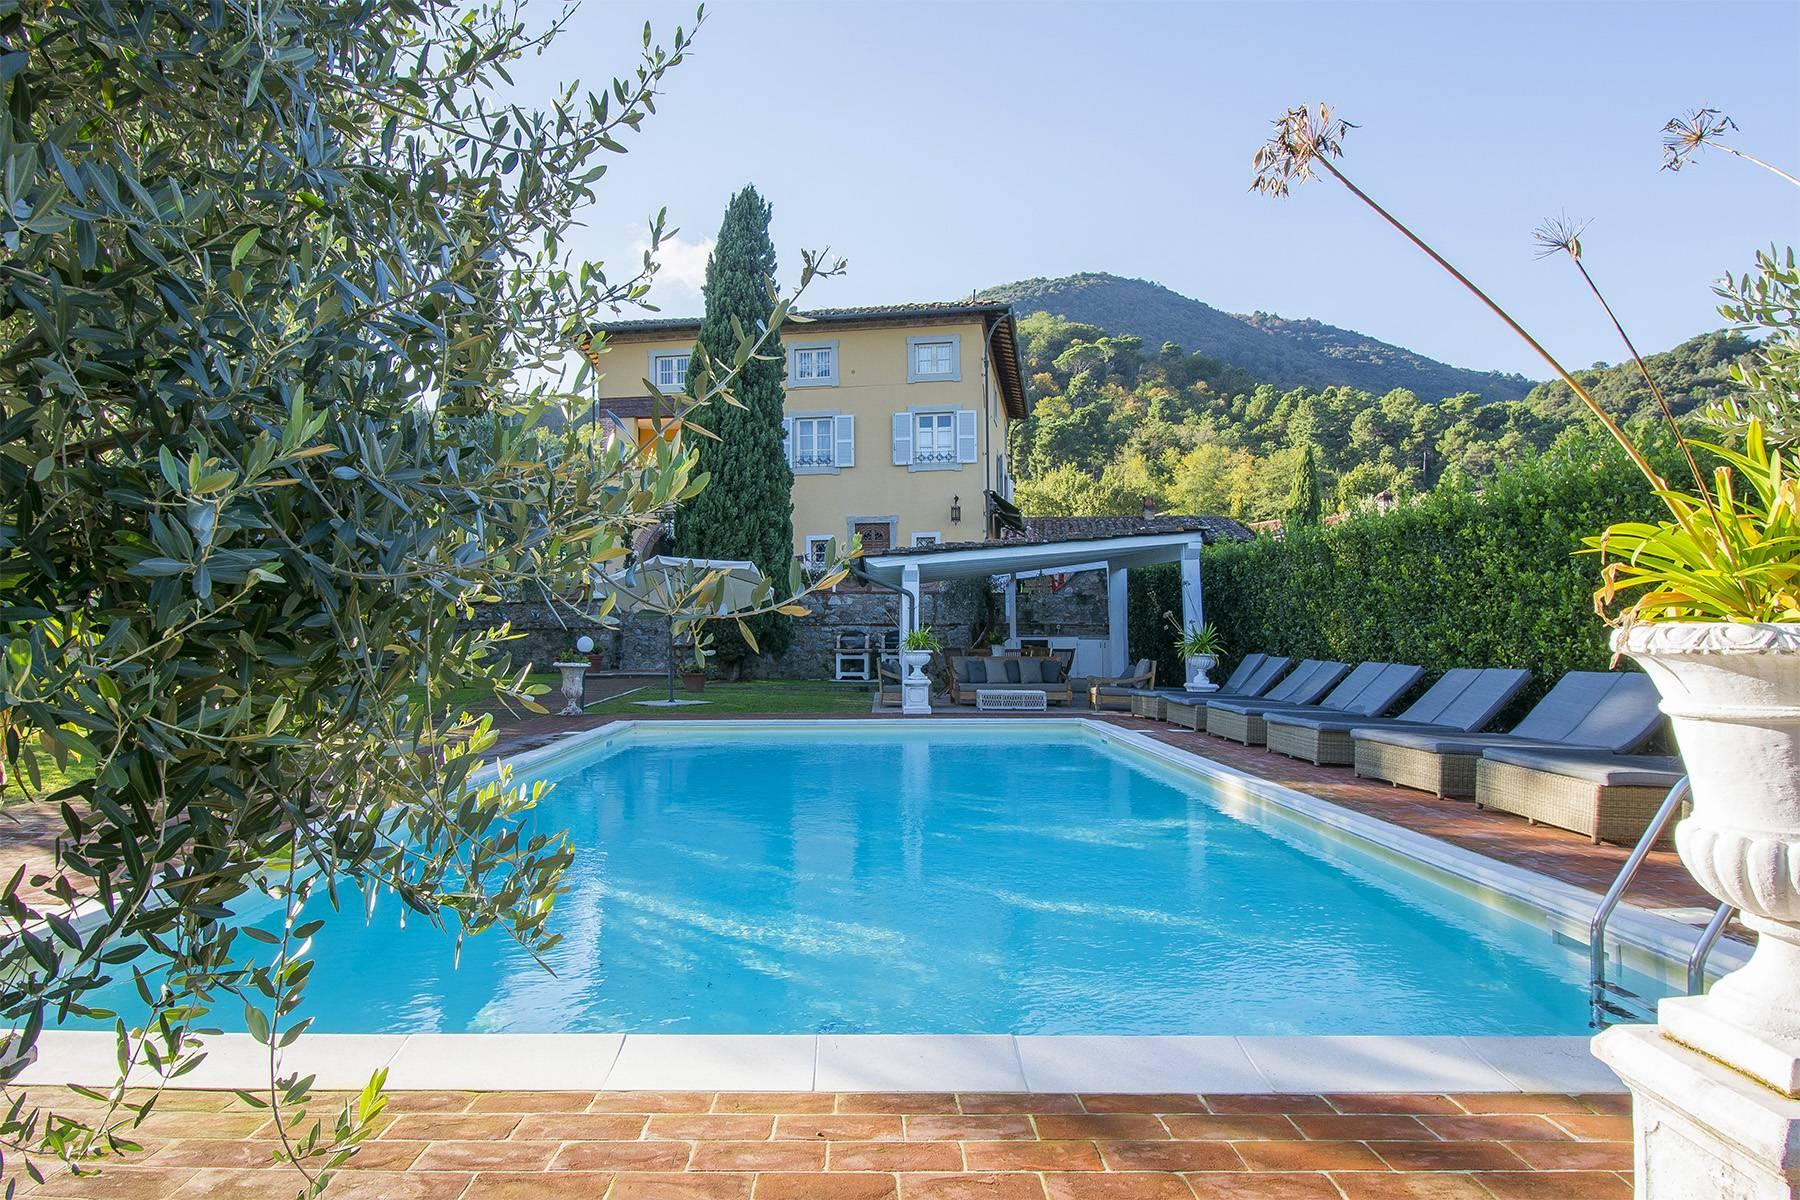 Romantic luxury Villa on the hills of Lucca - 5